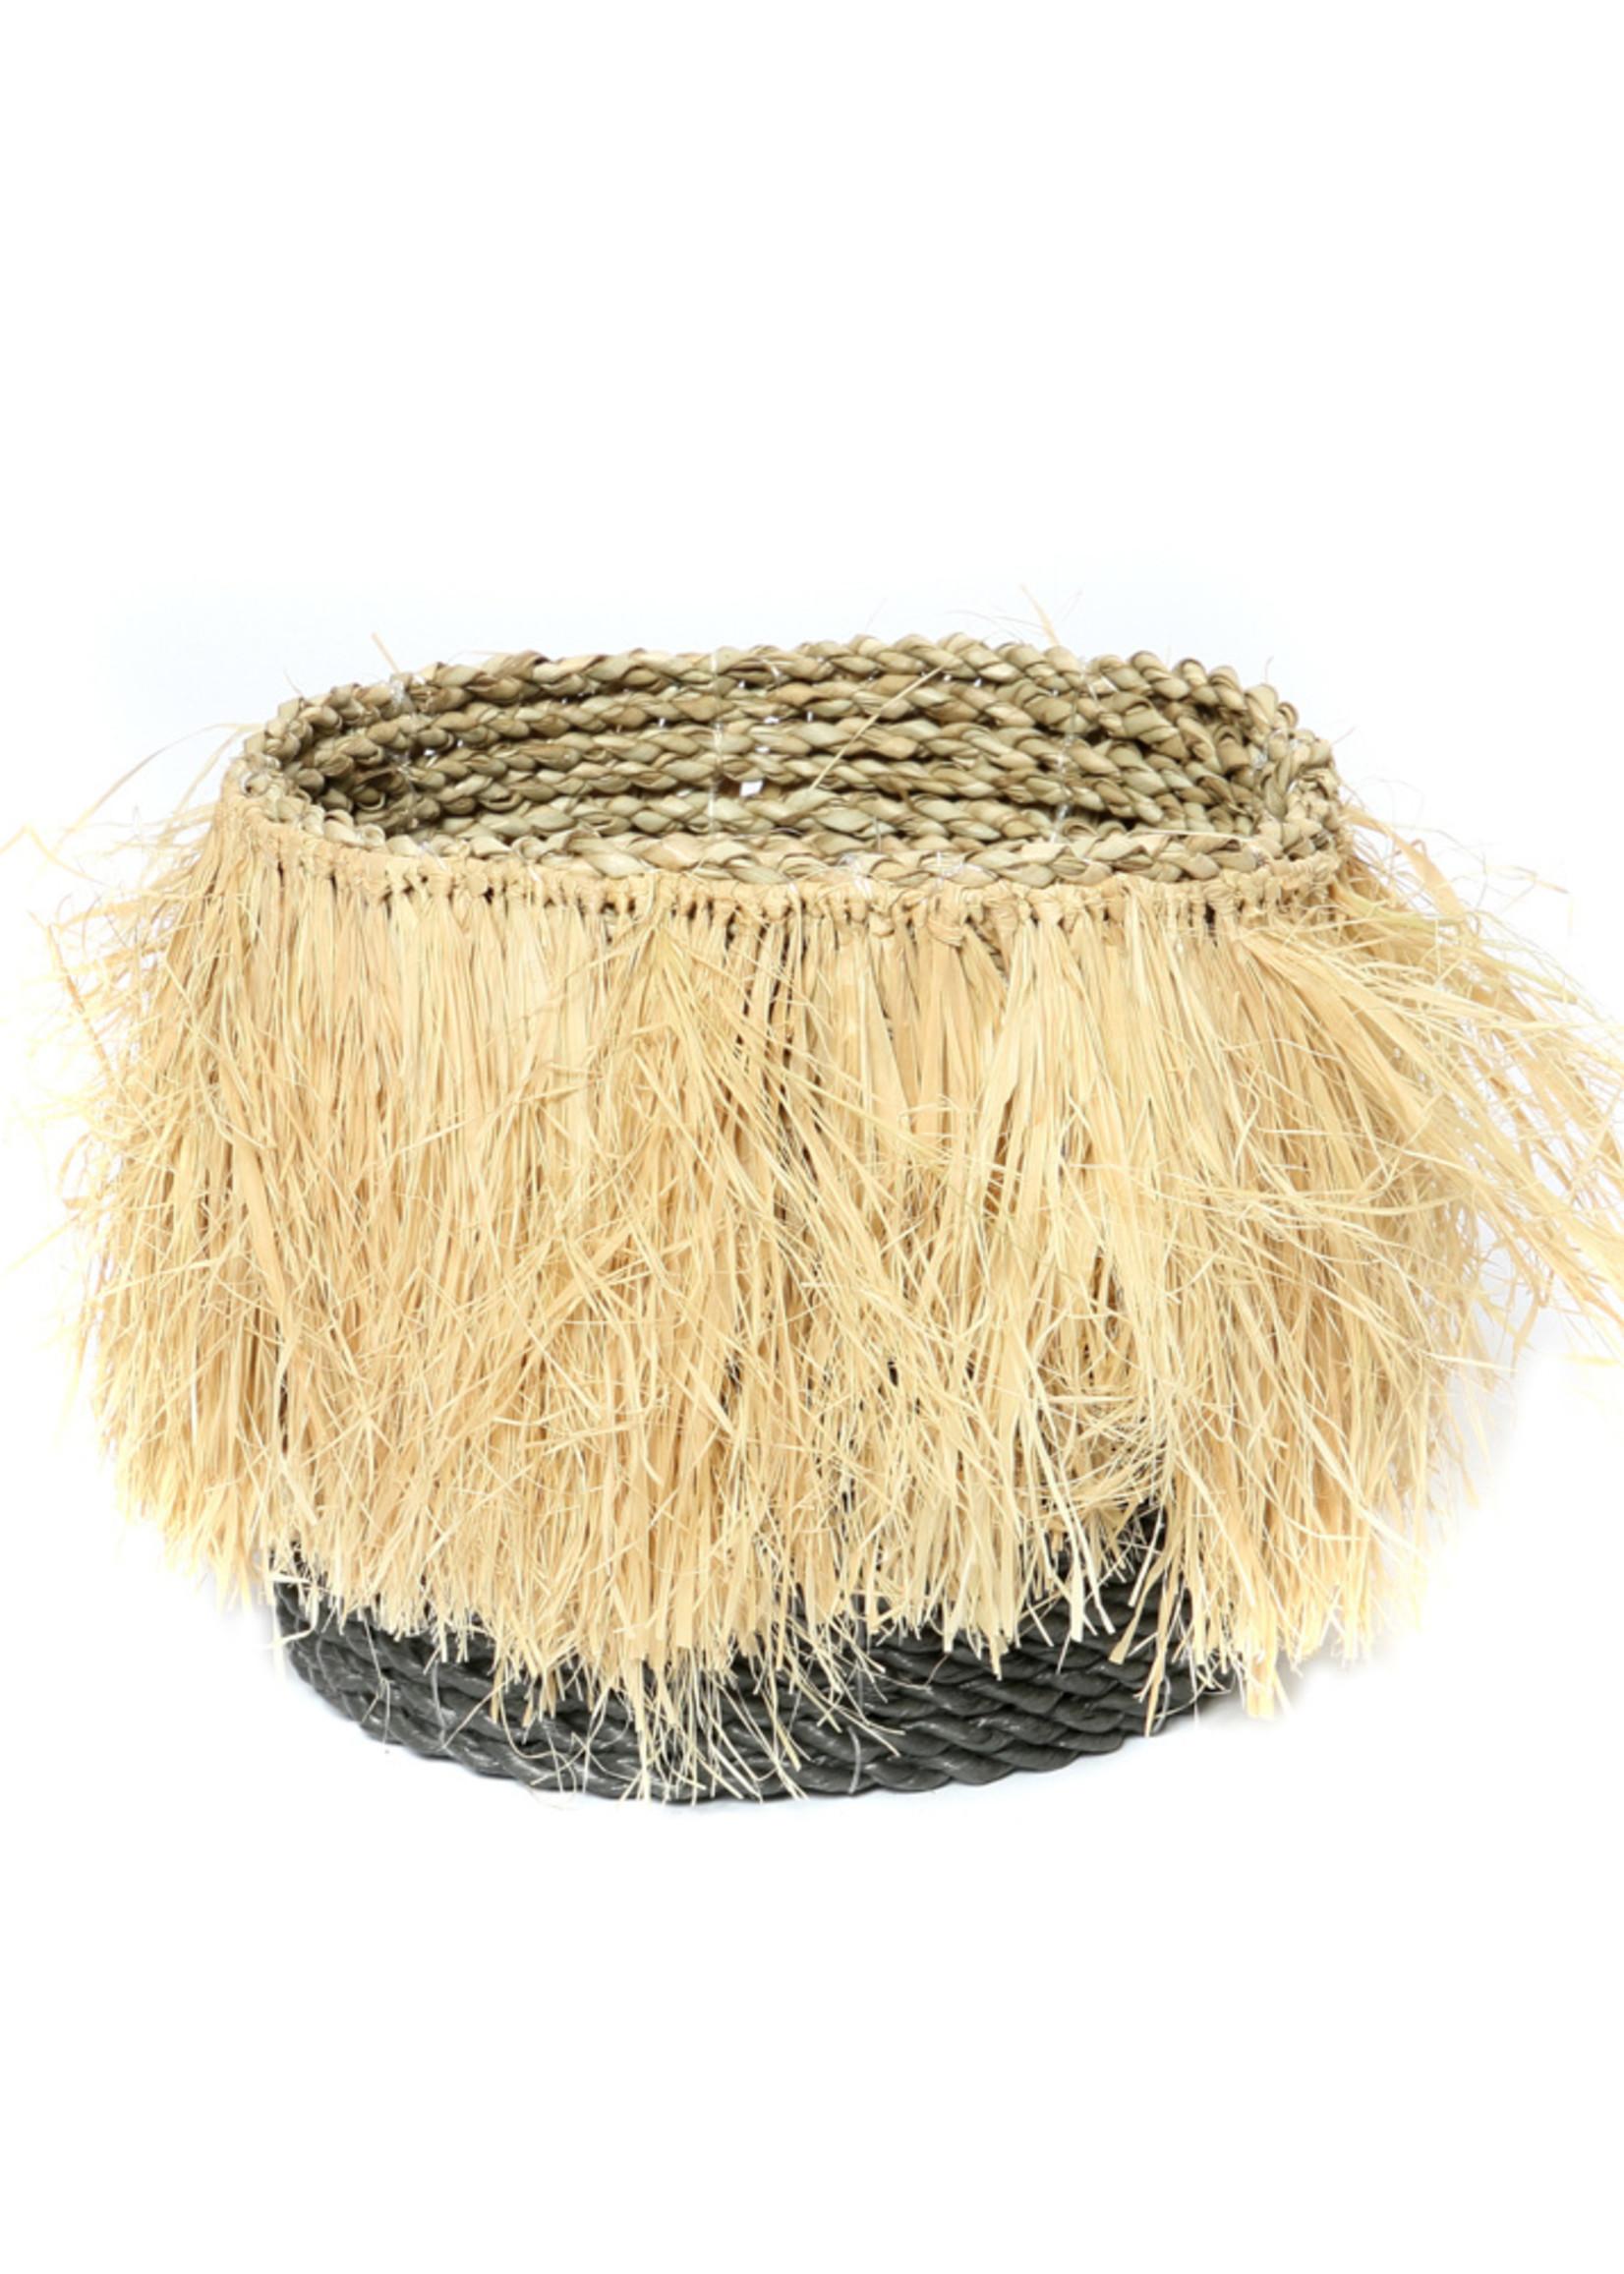 The Aloha Baskets - Black Natural - S